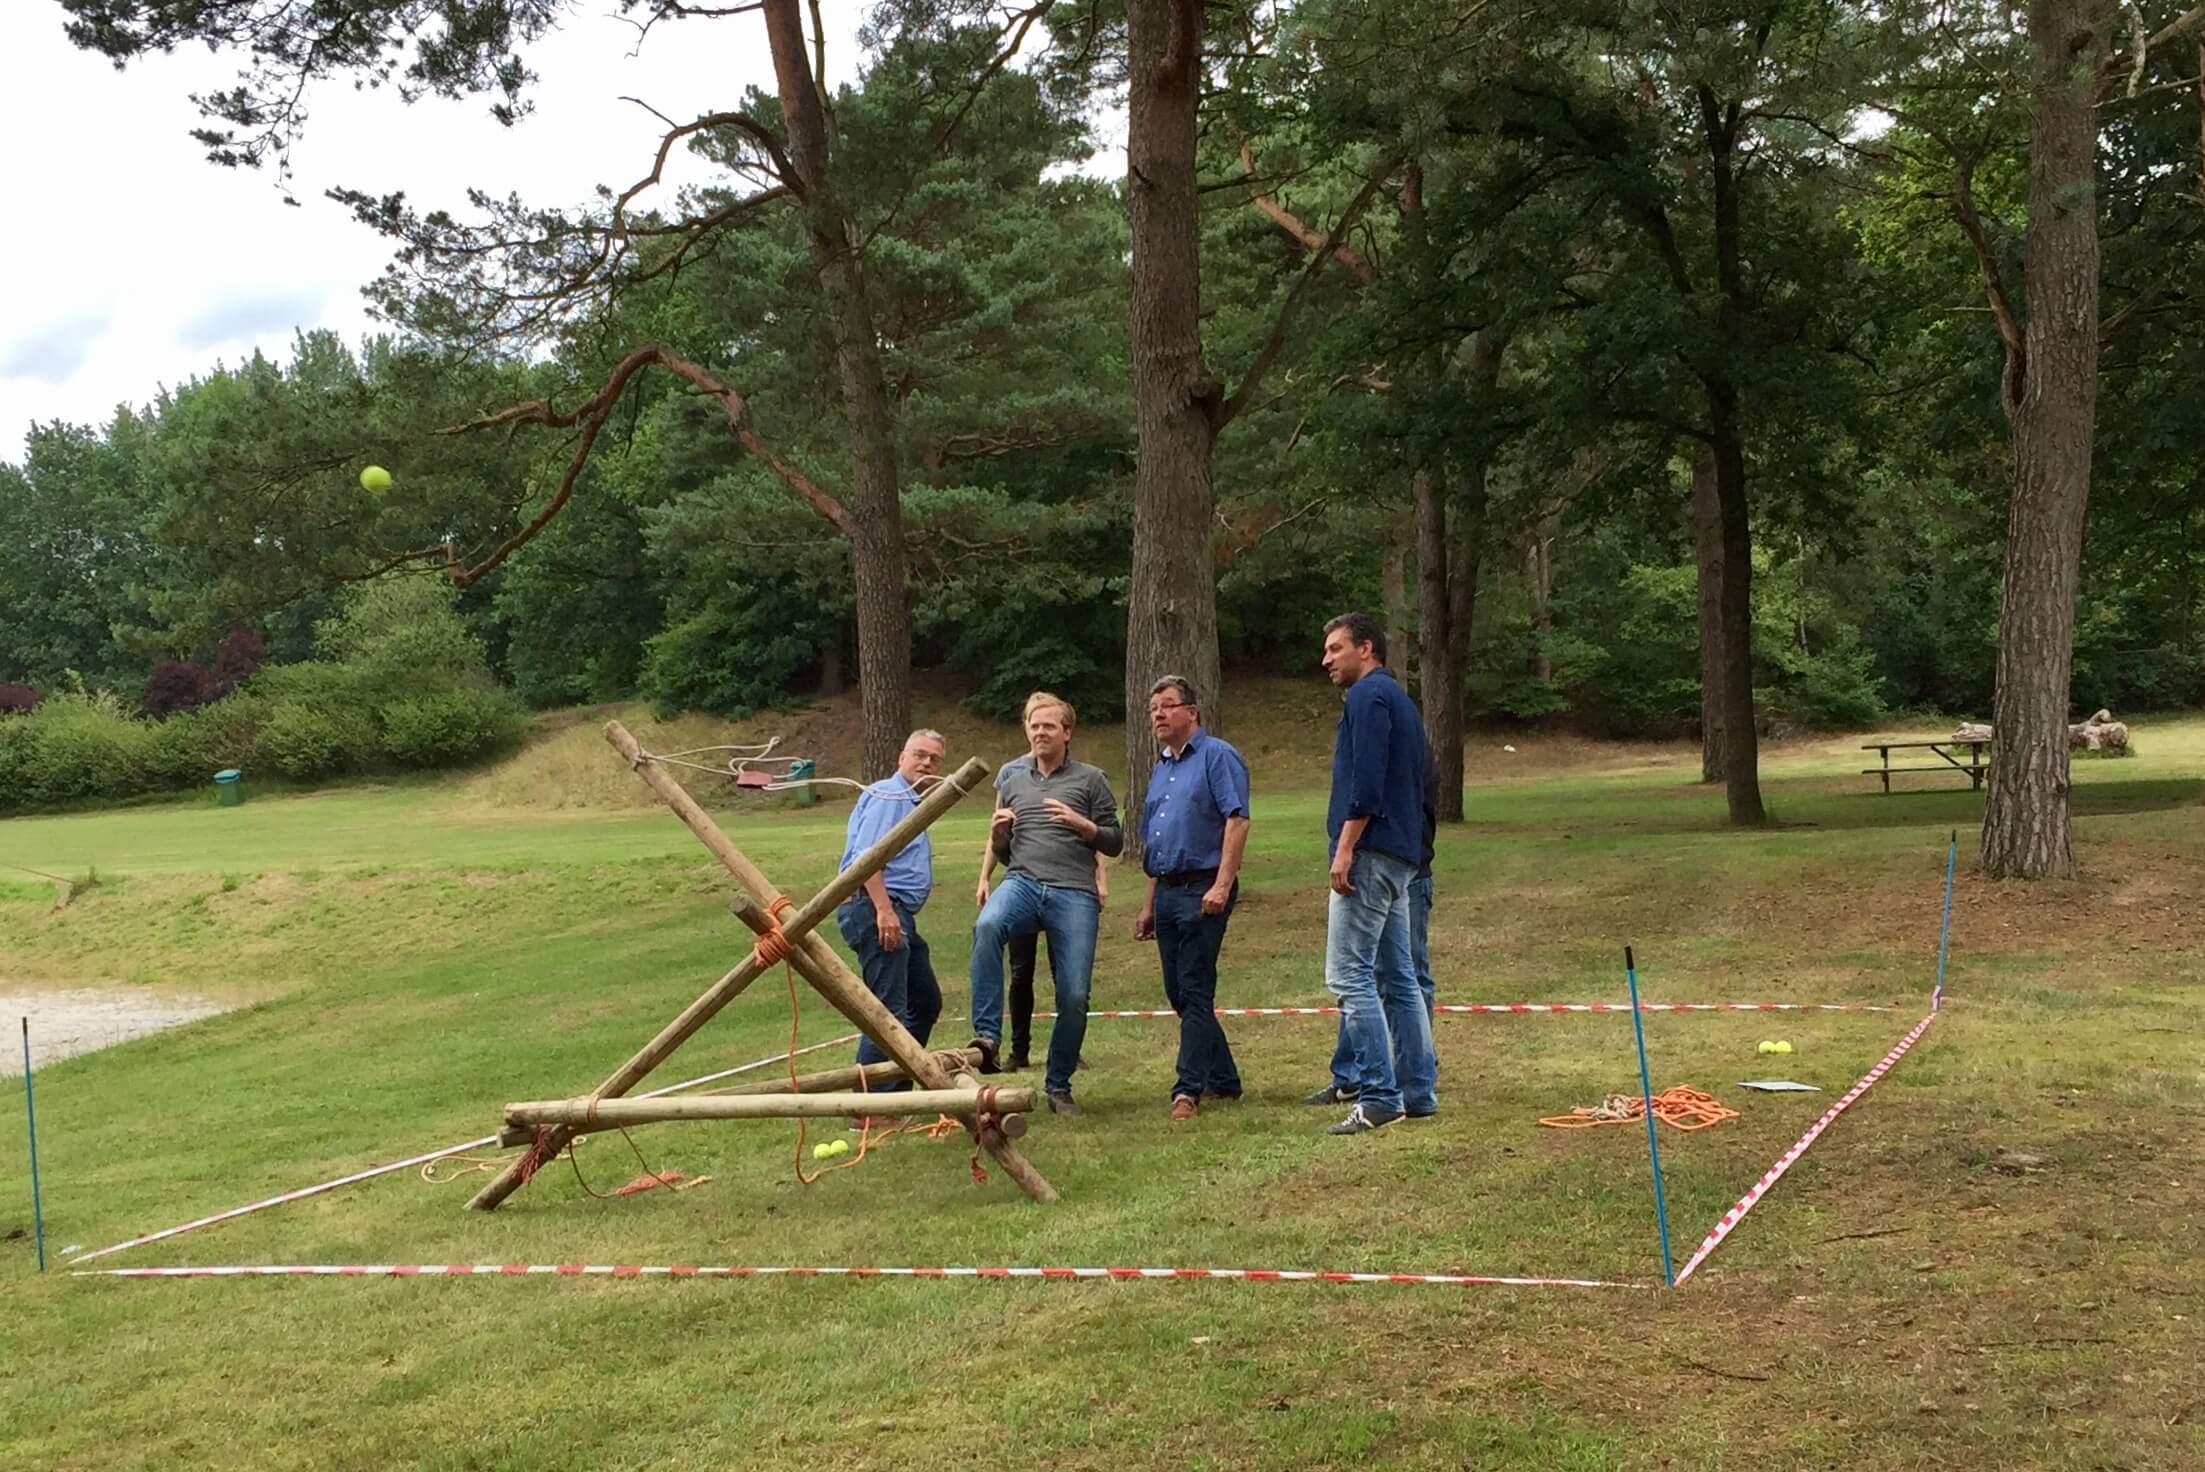 Mega-katapult-bouwen-en-schieten-teambuilding-samenwerken-2